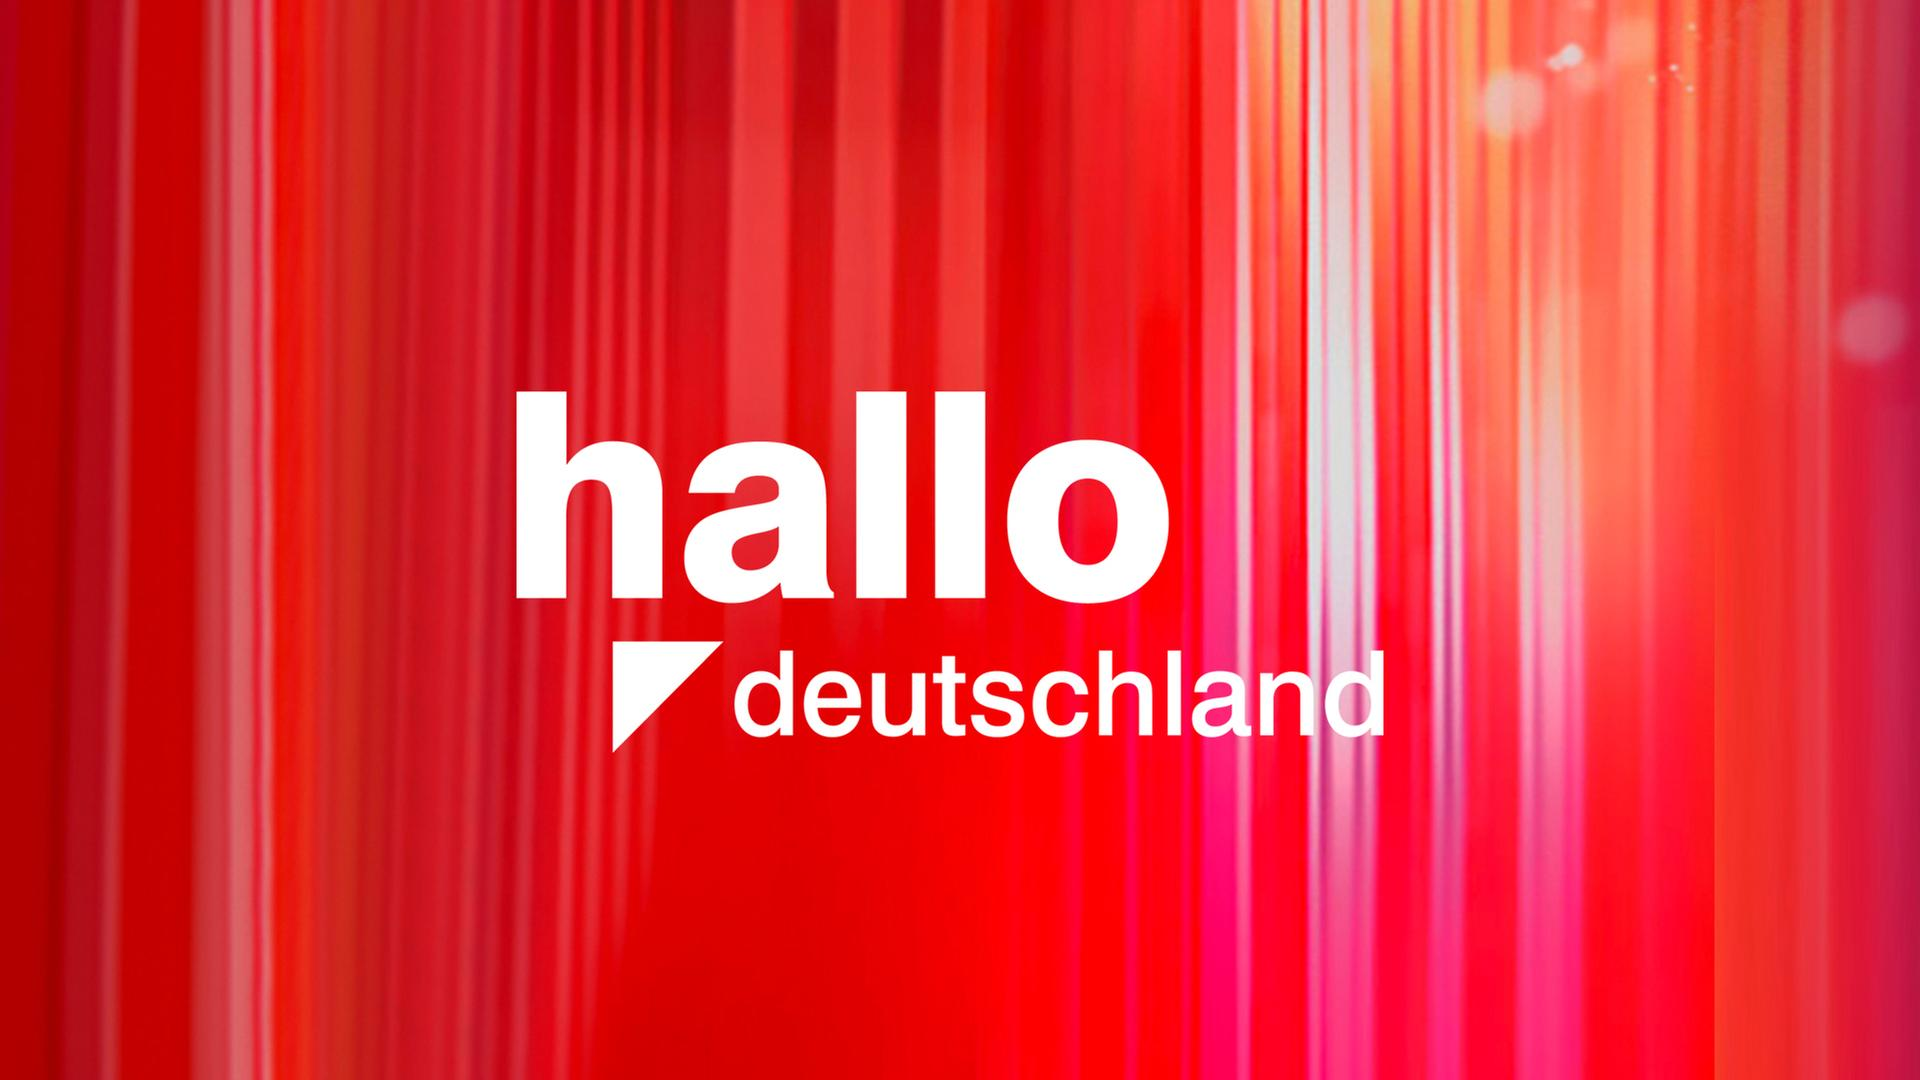 Hallo Deutschland Zdfmediathek